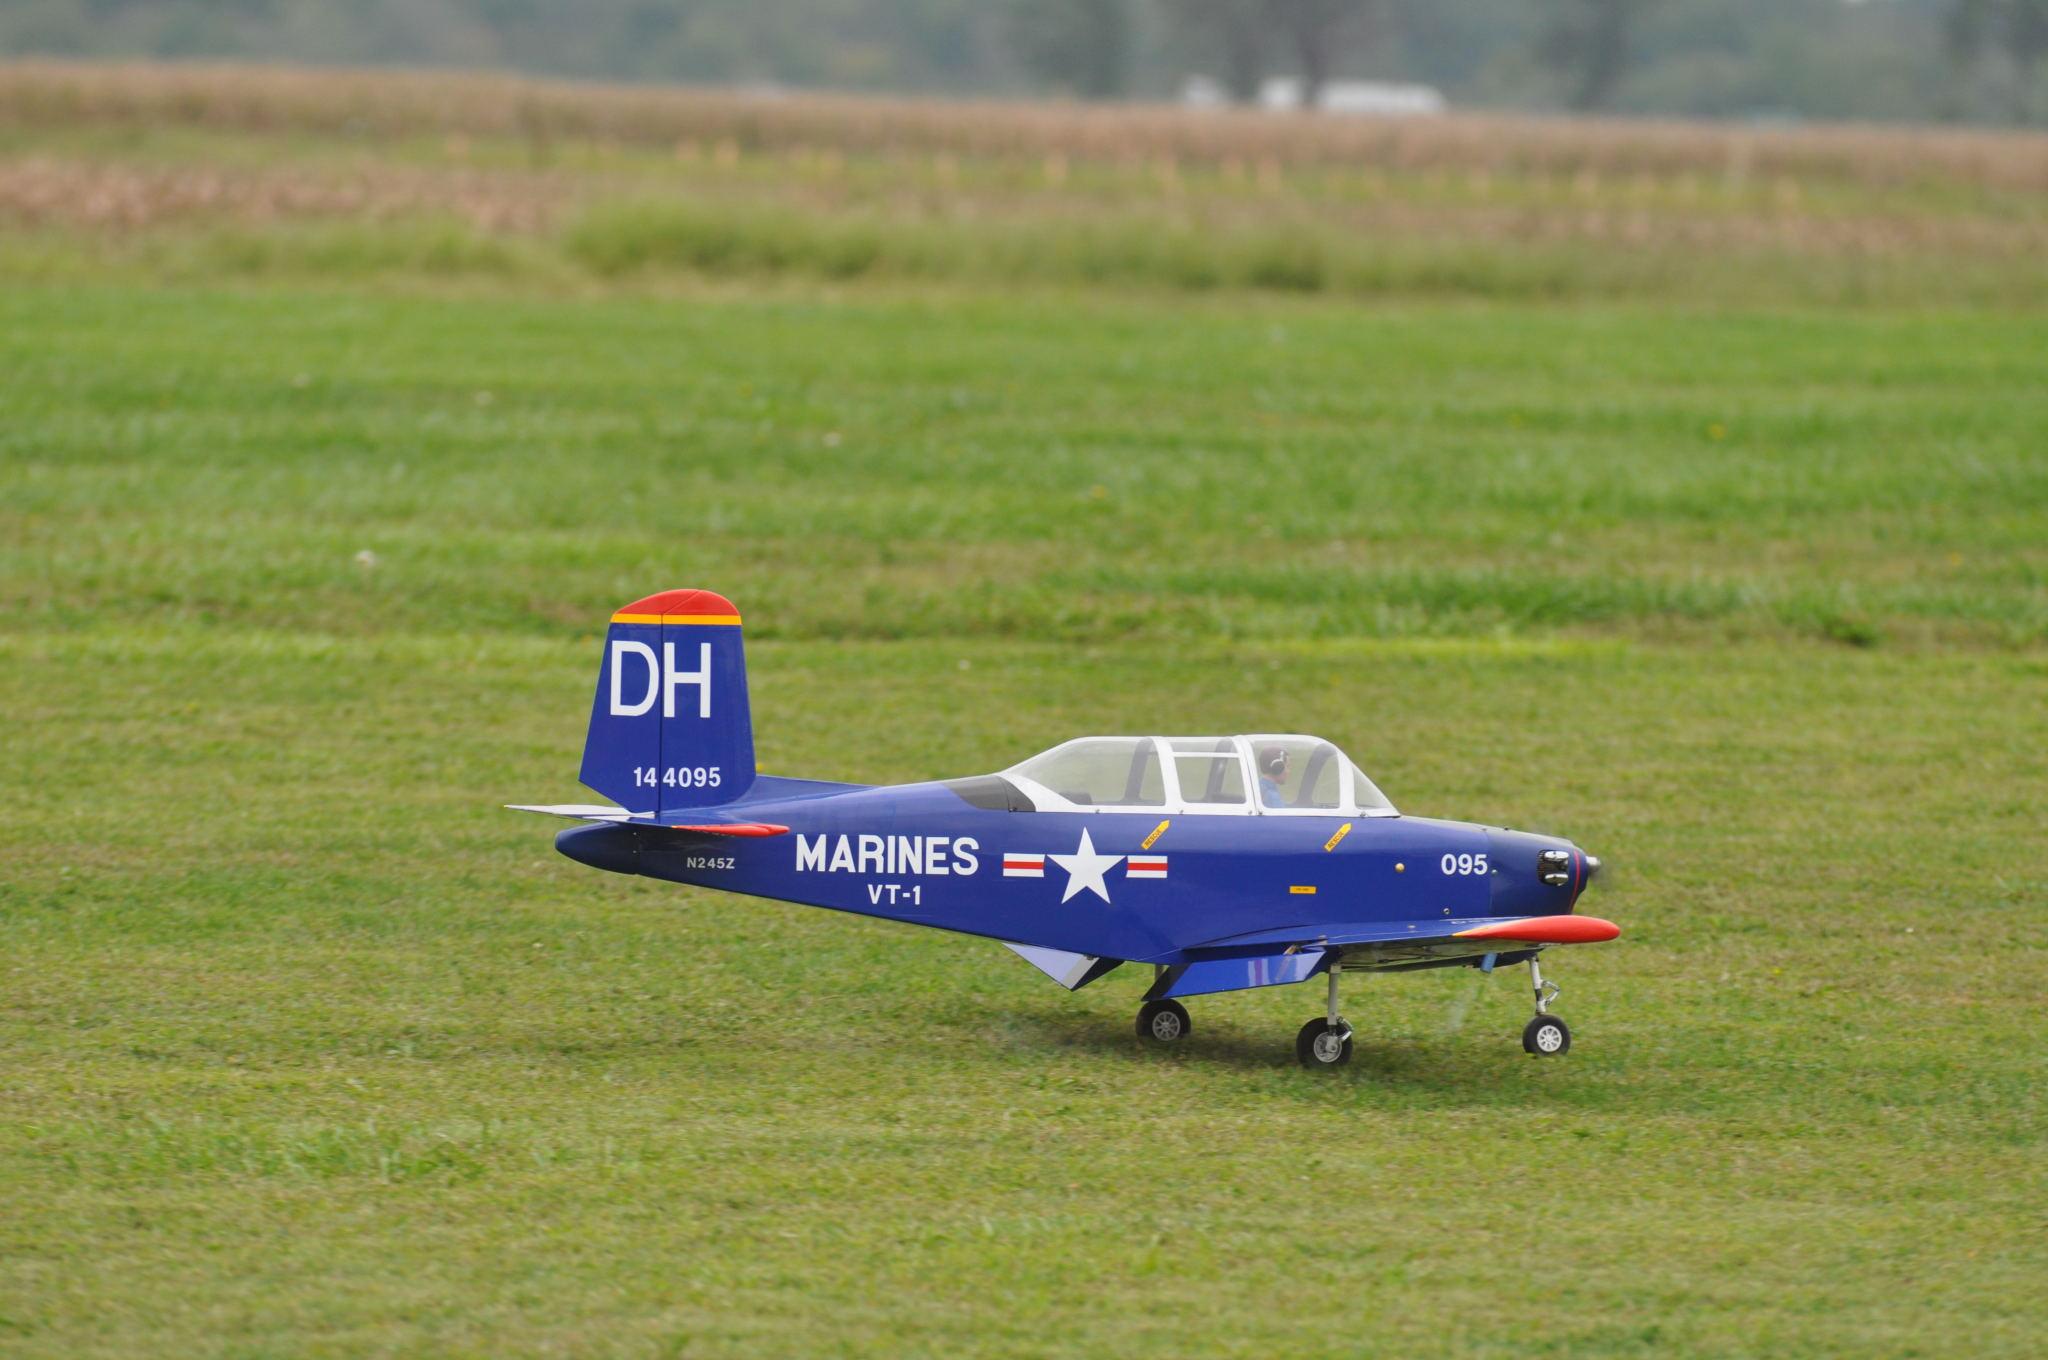 DSC_9354.JPG